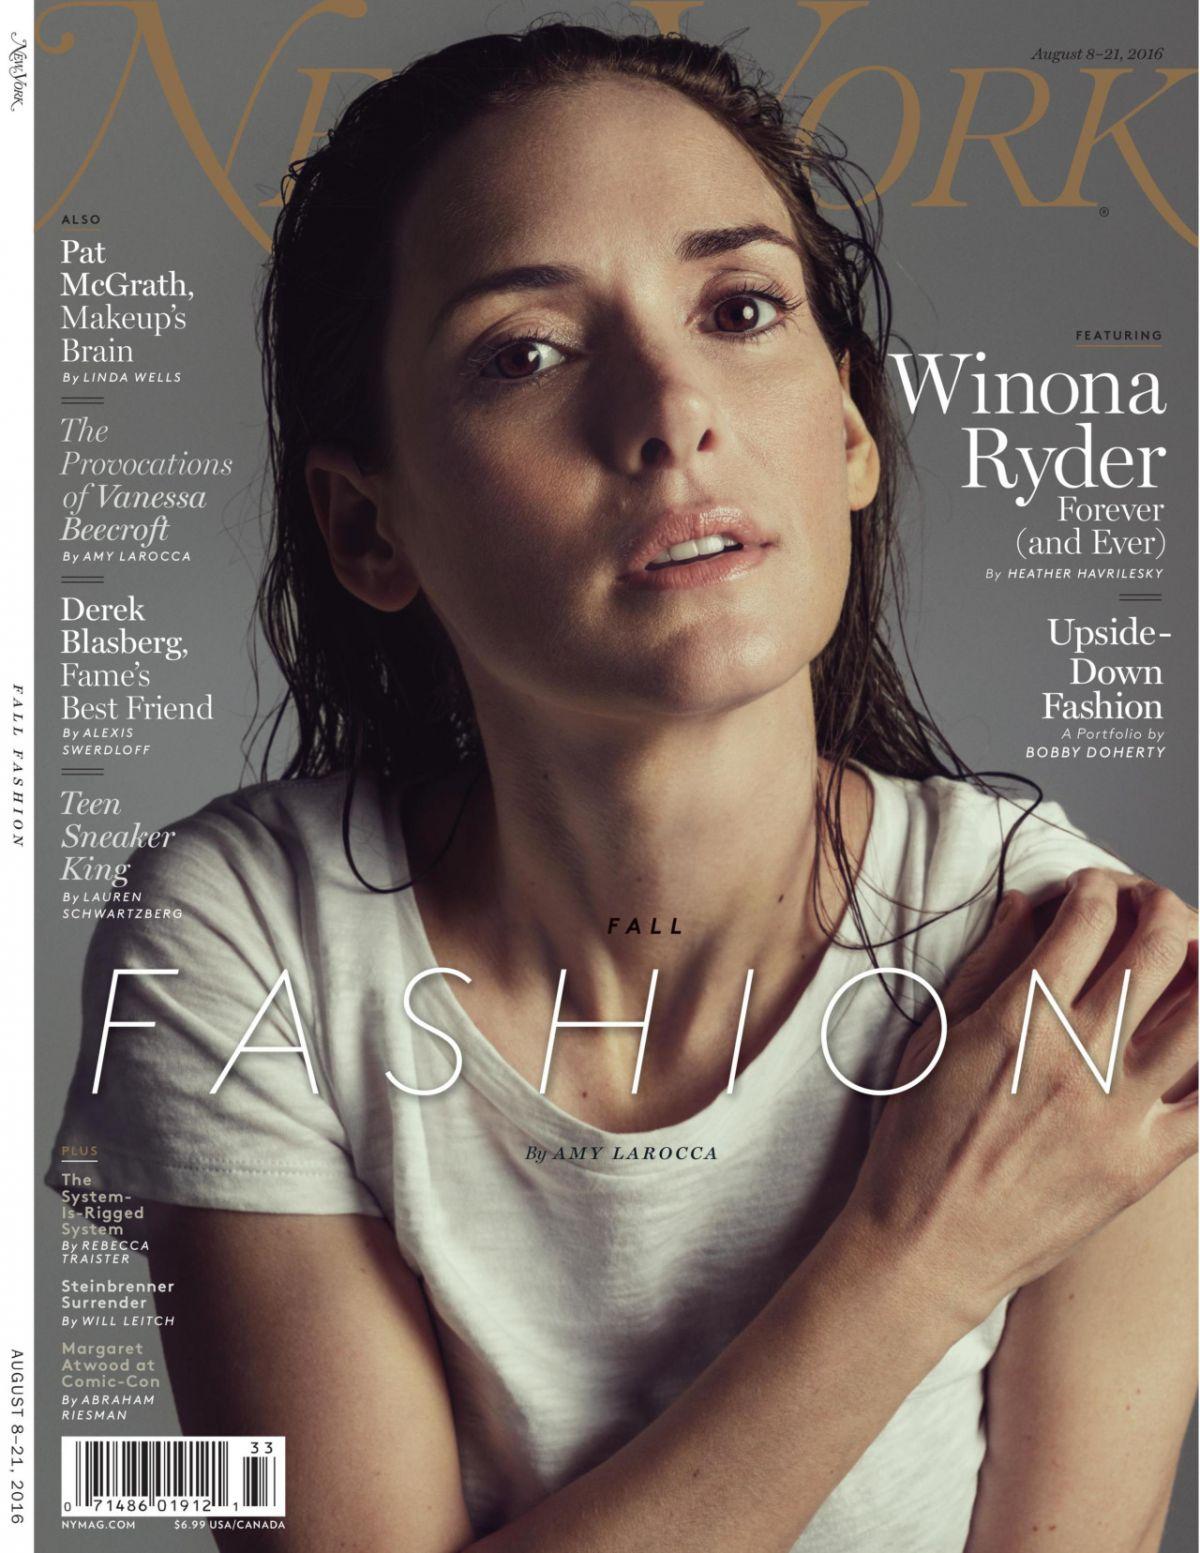 Winnona Ryder PhotoShoot for New York Magazine 2016 August Issue